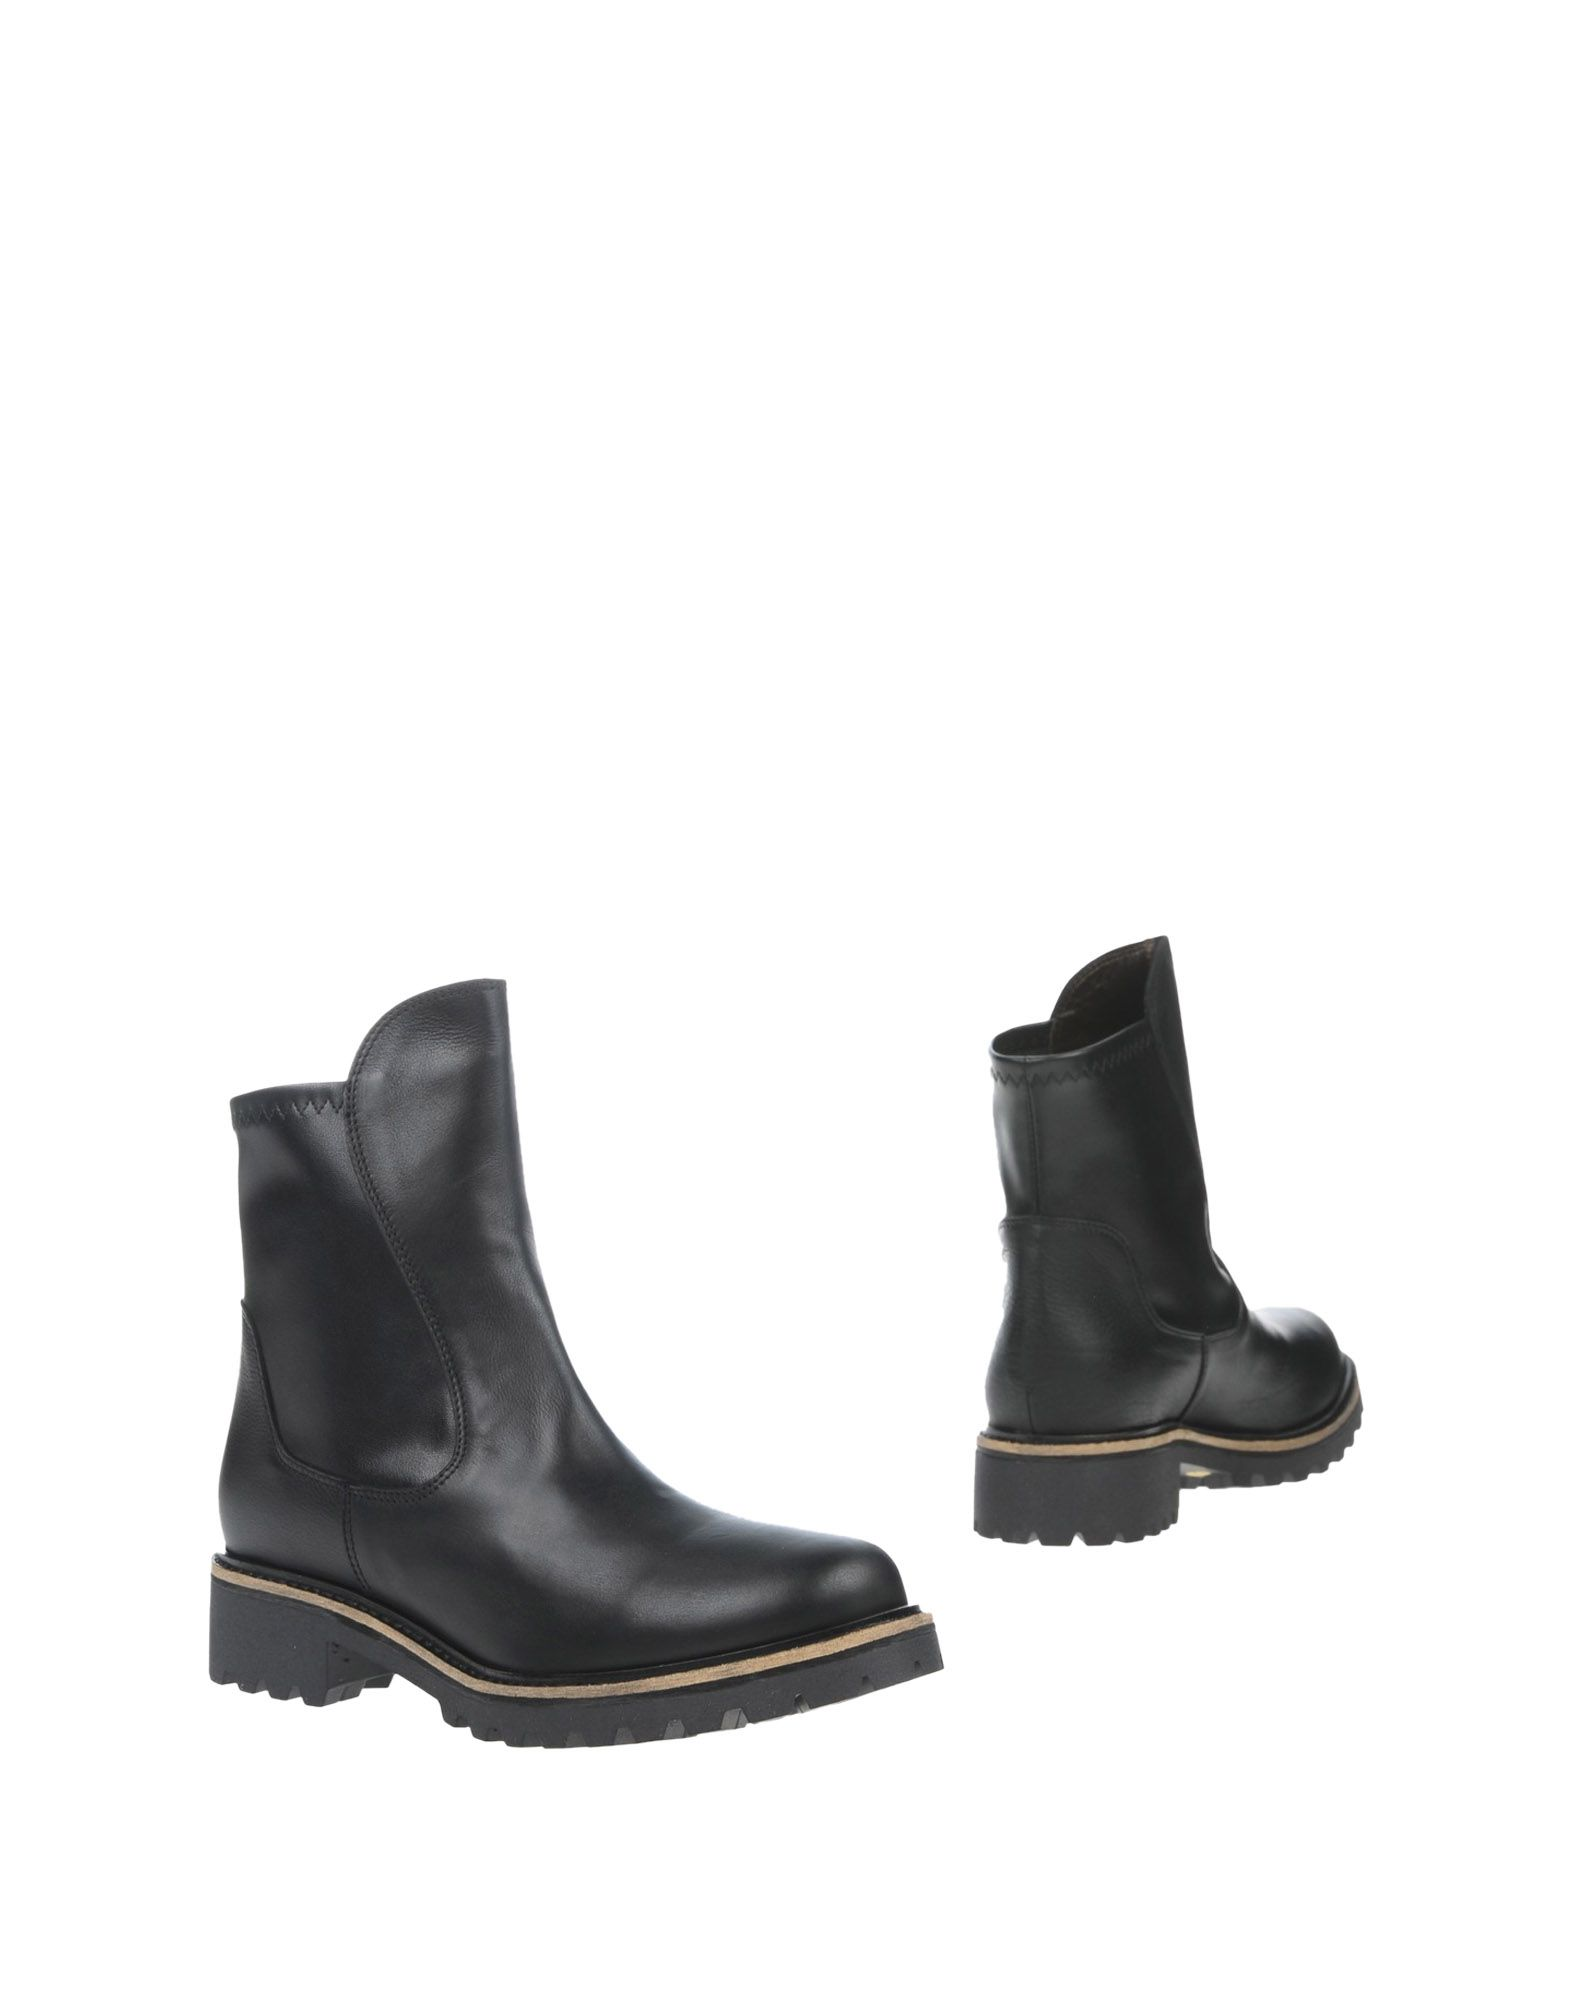 Stilvolle Chelsea billige Schuhe F.Lli Bruglia Chelsea Stilvolle Stiefel Damen  11303407EF a33f61